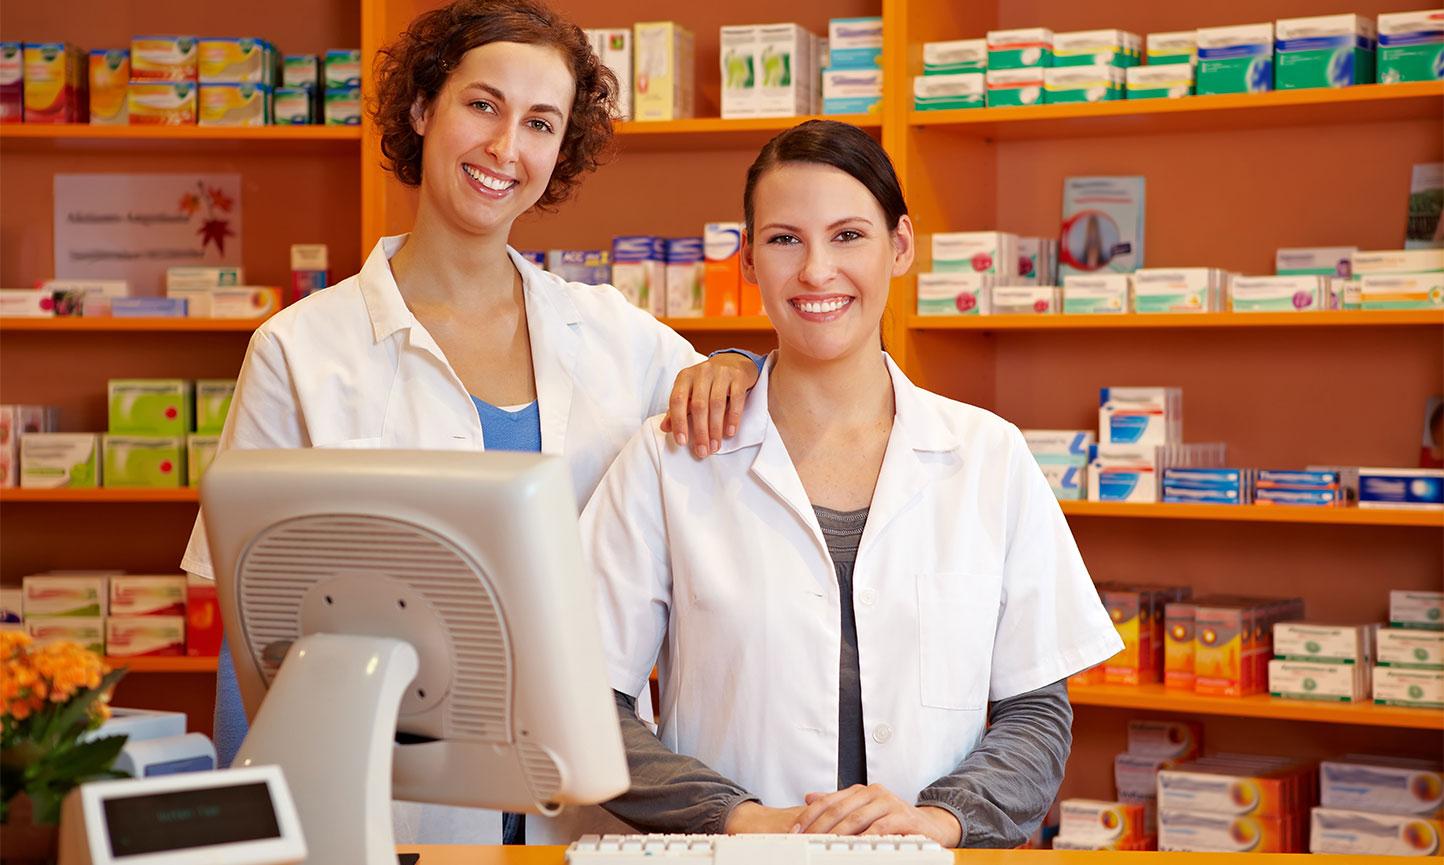 Pharmacy Technician Certification Exam Ptce